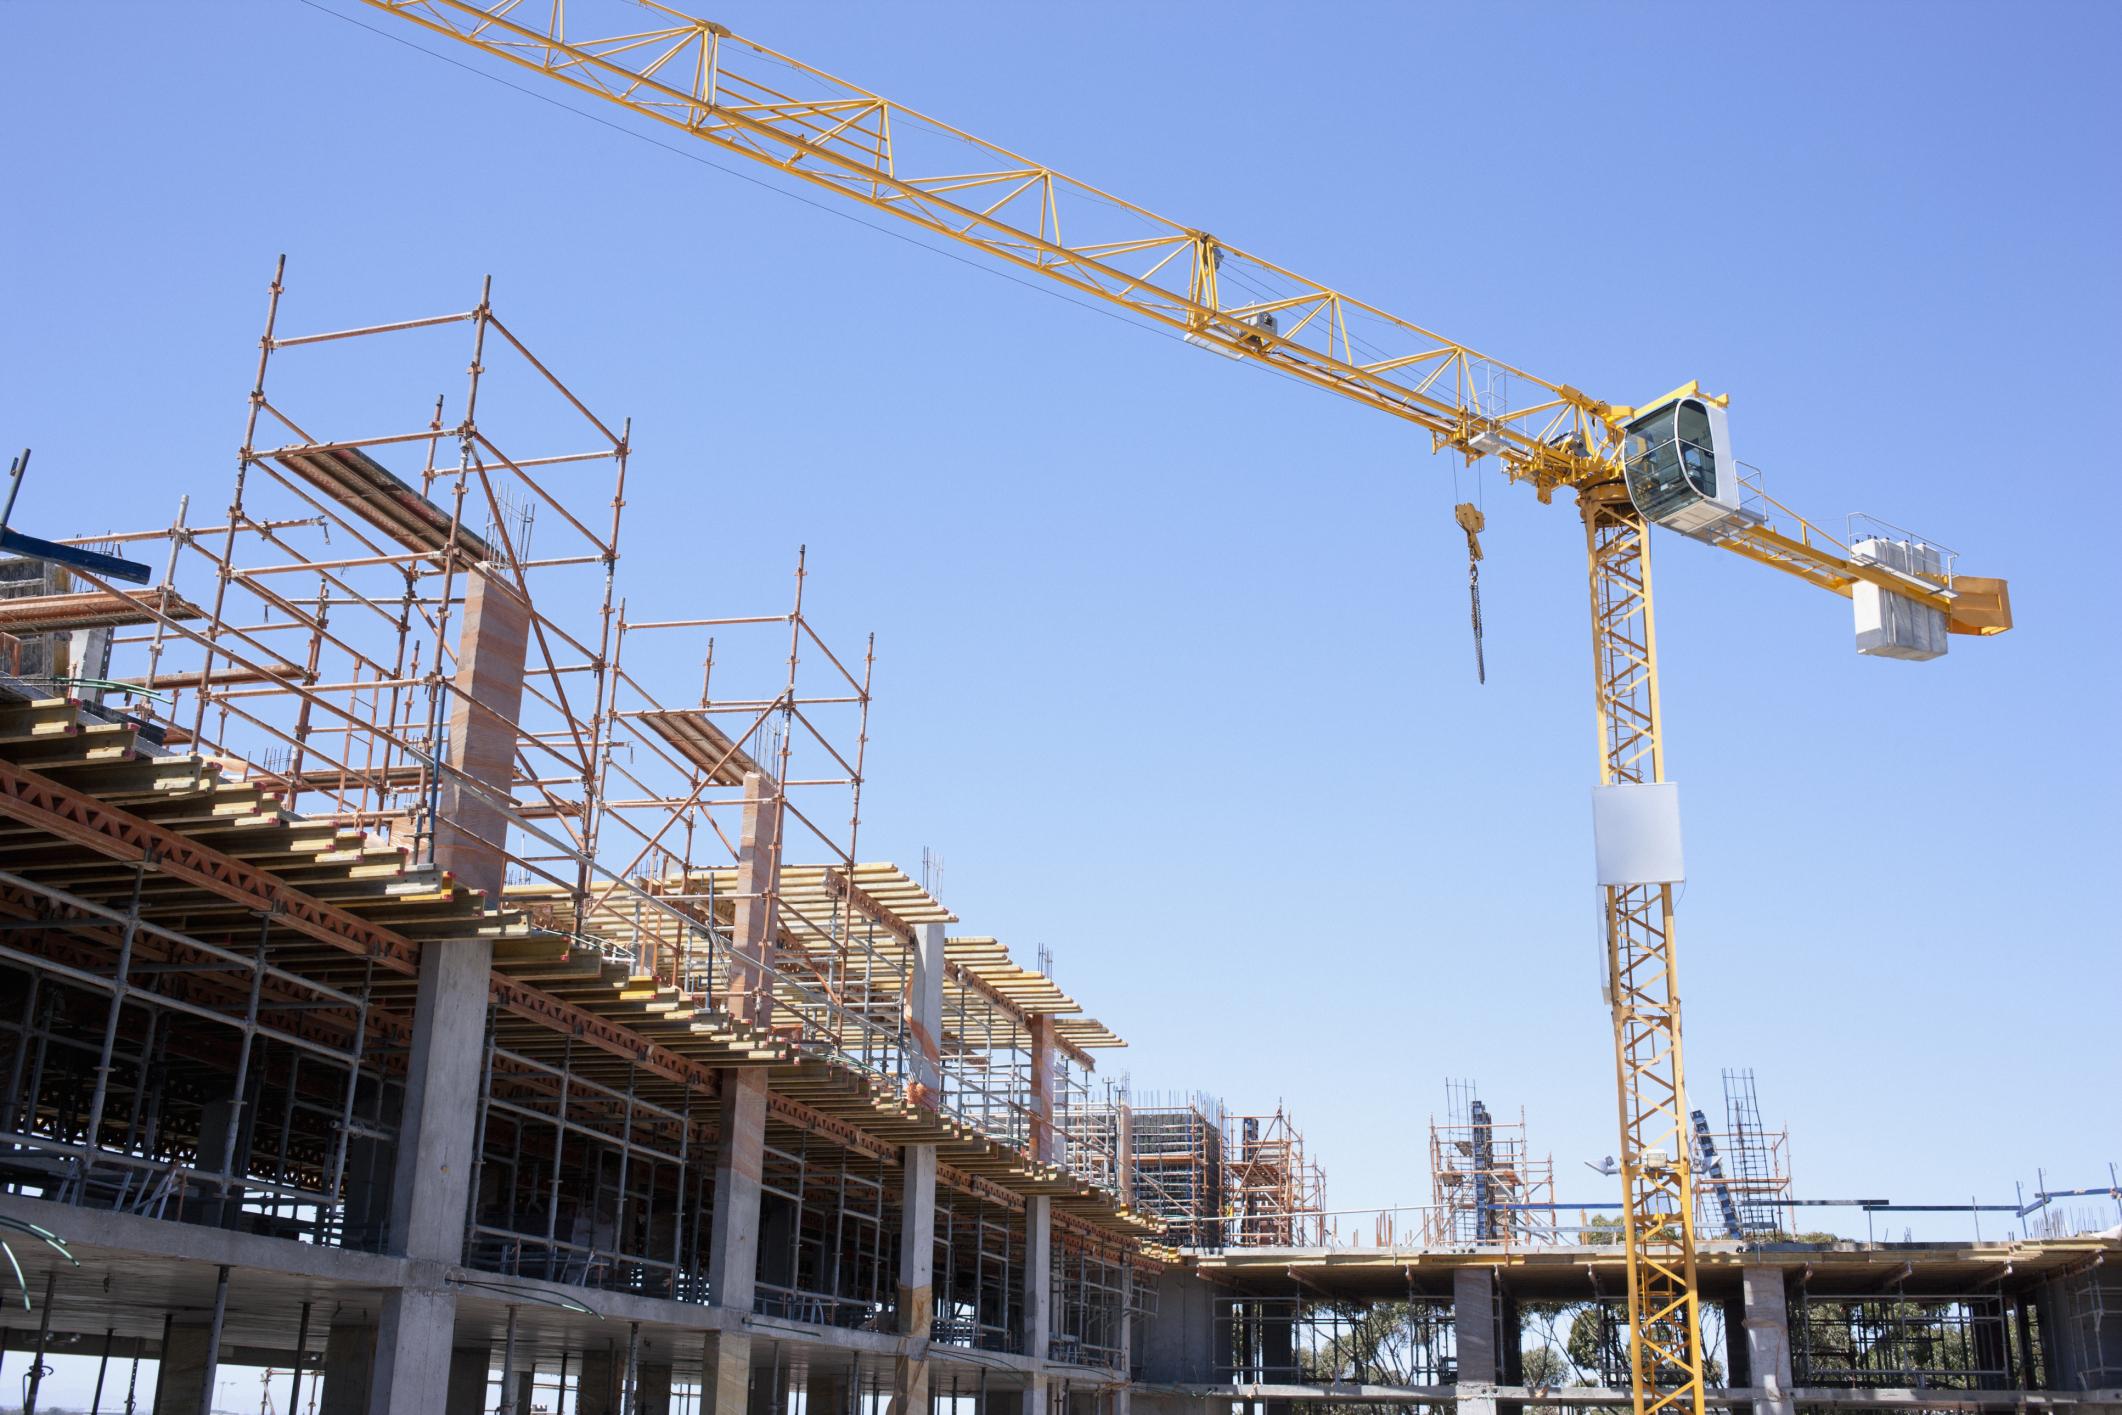 Construction: Zambia